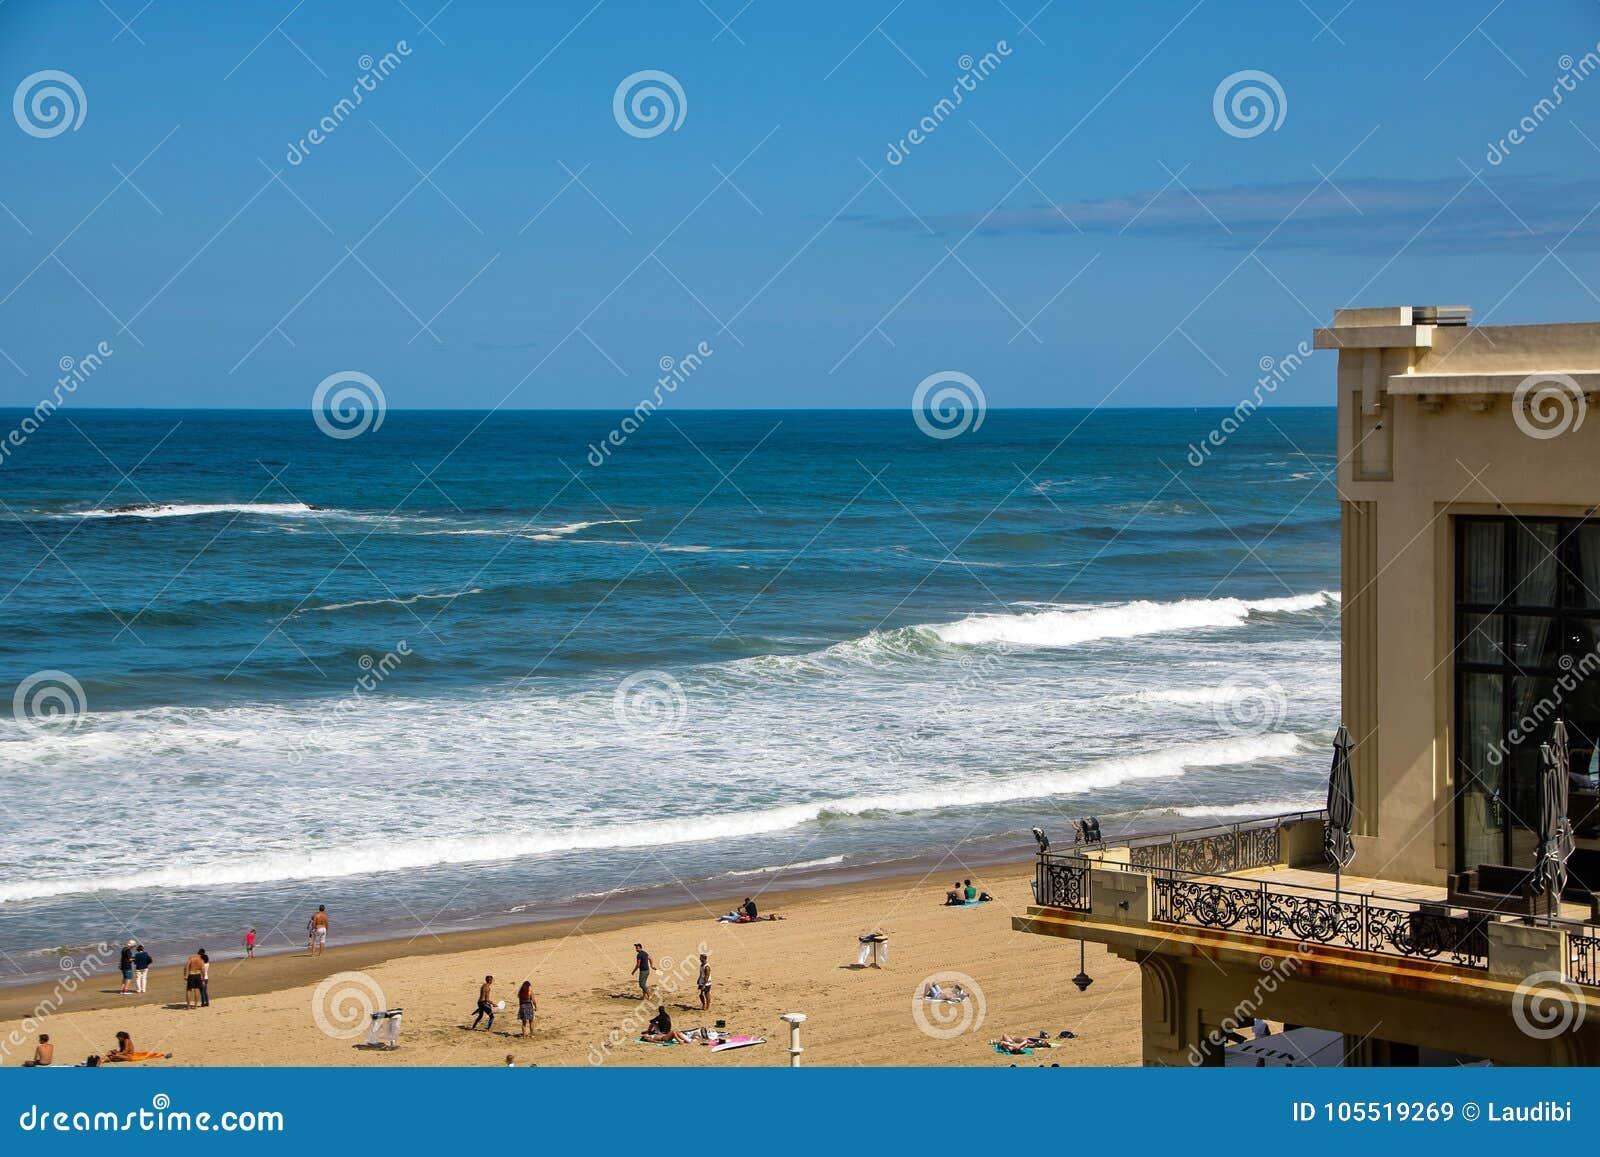 Losu Angeles grande plage wielka plaża Biarritz